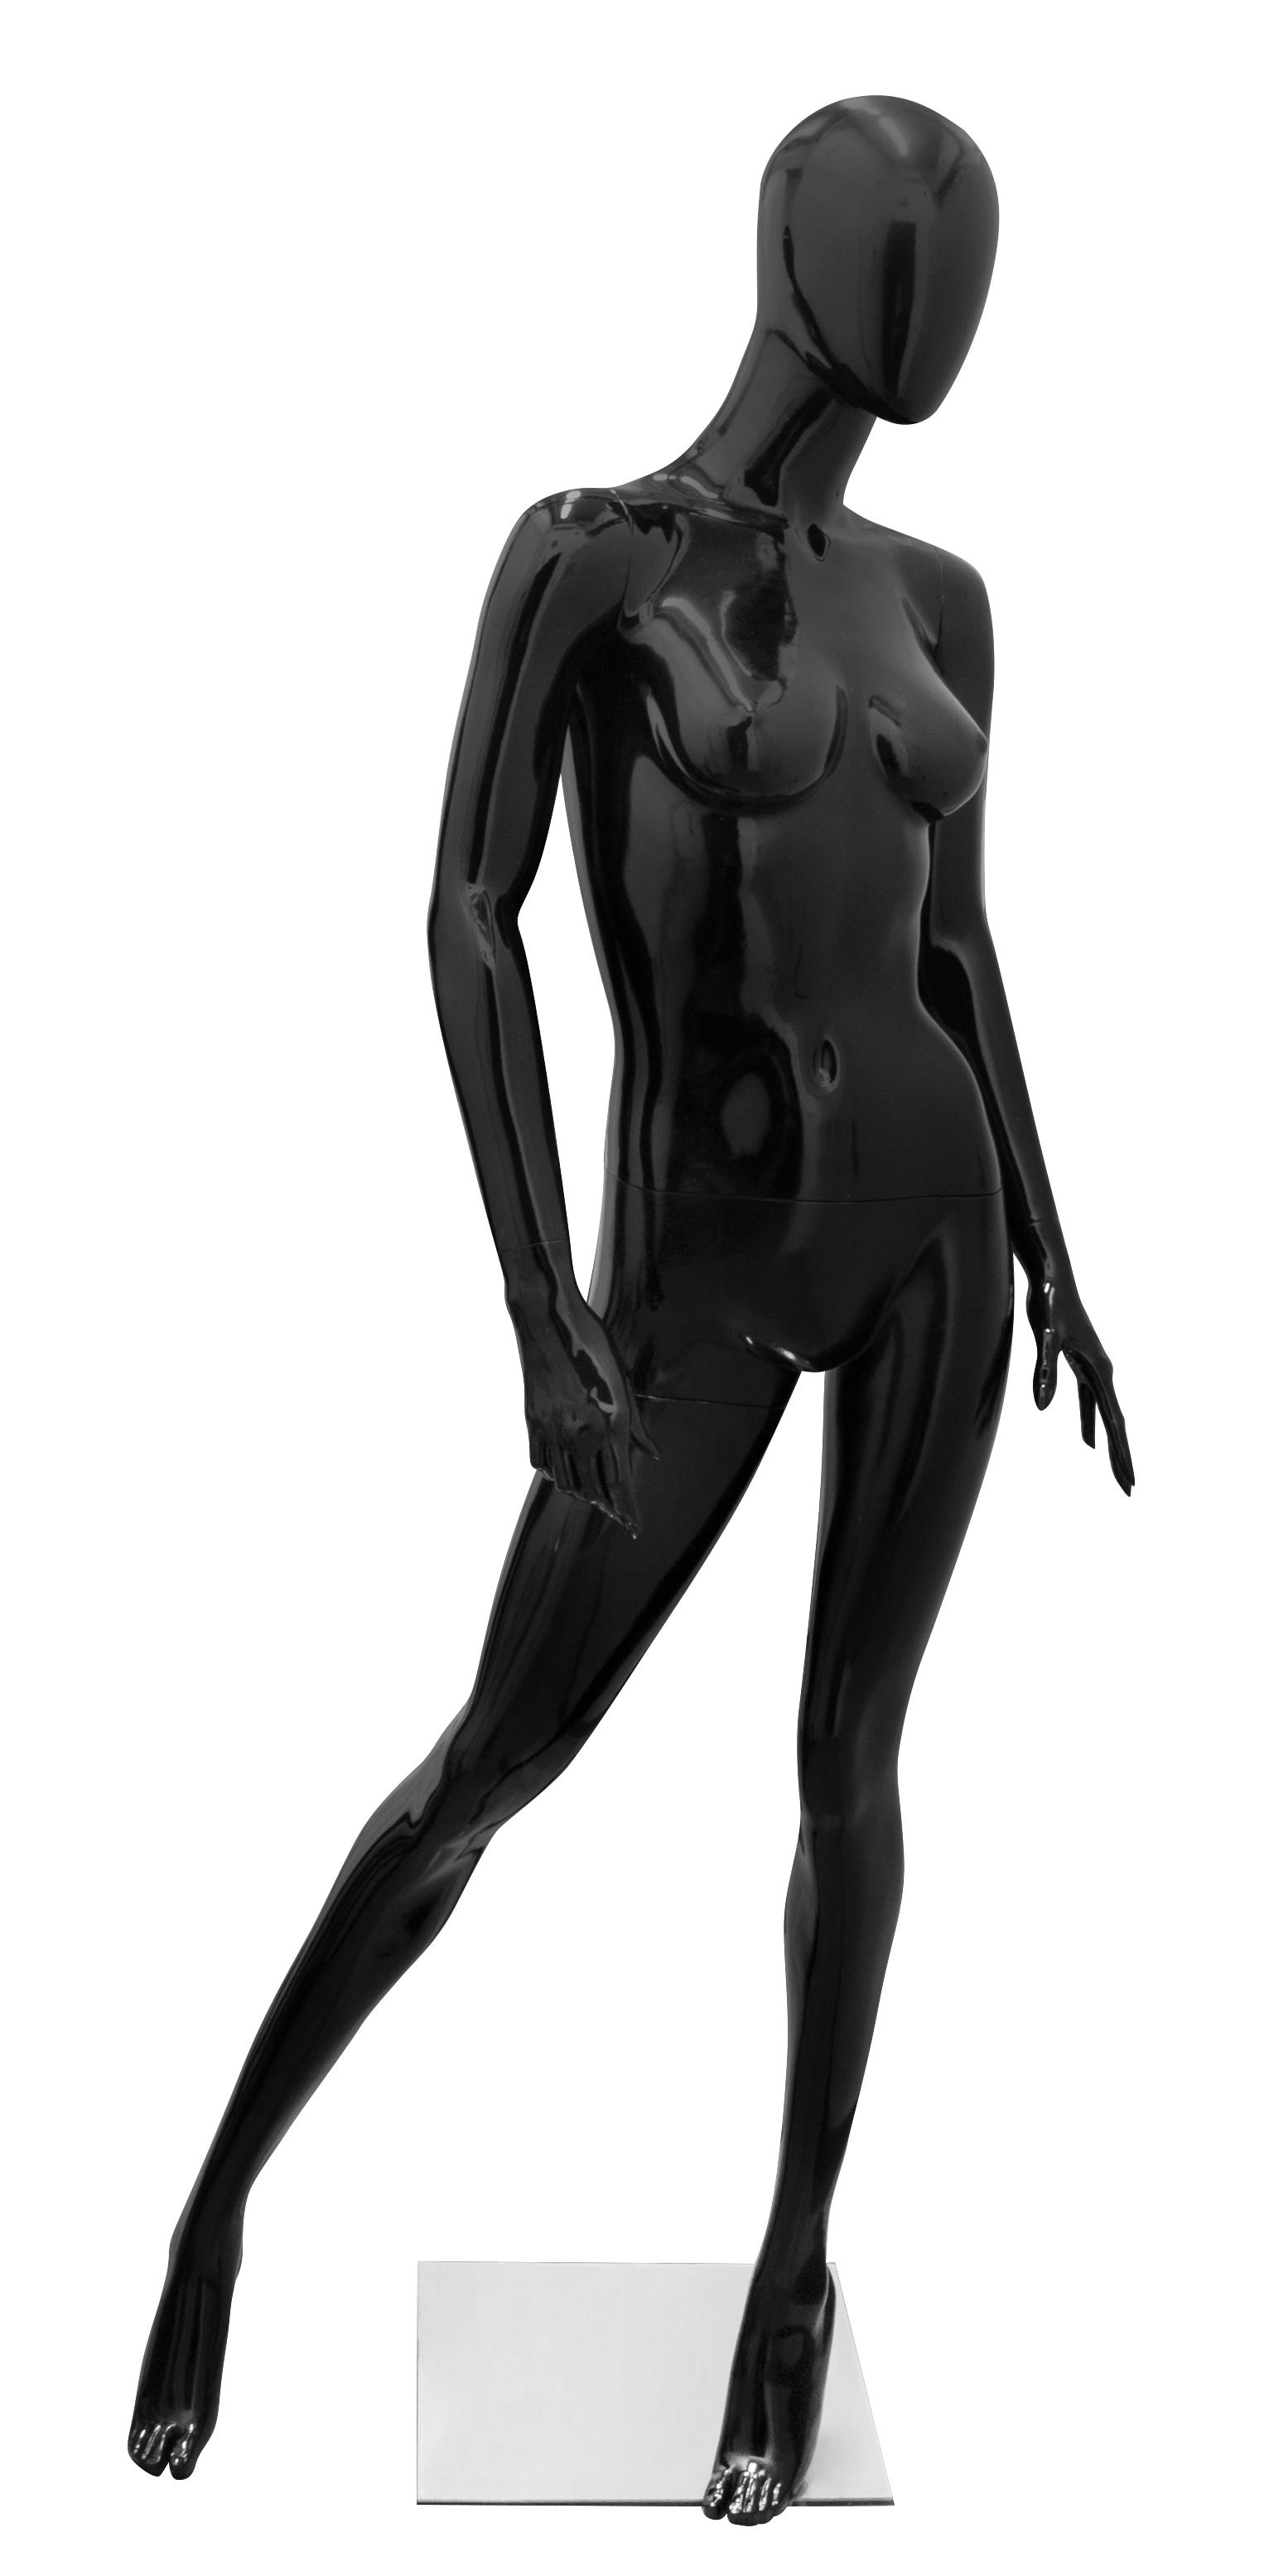 figurína dámská WOMAN1 (pootočená doleva) černá